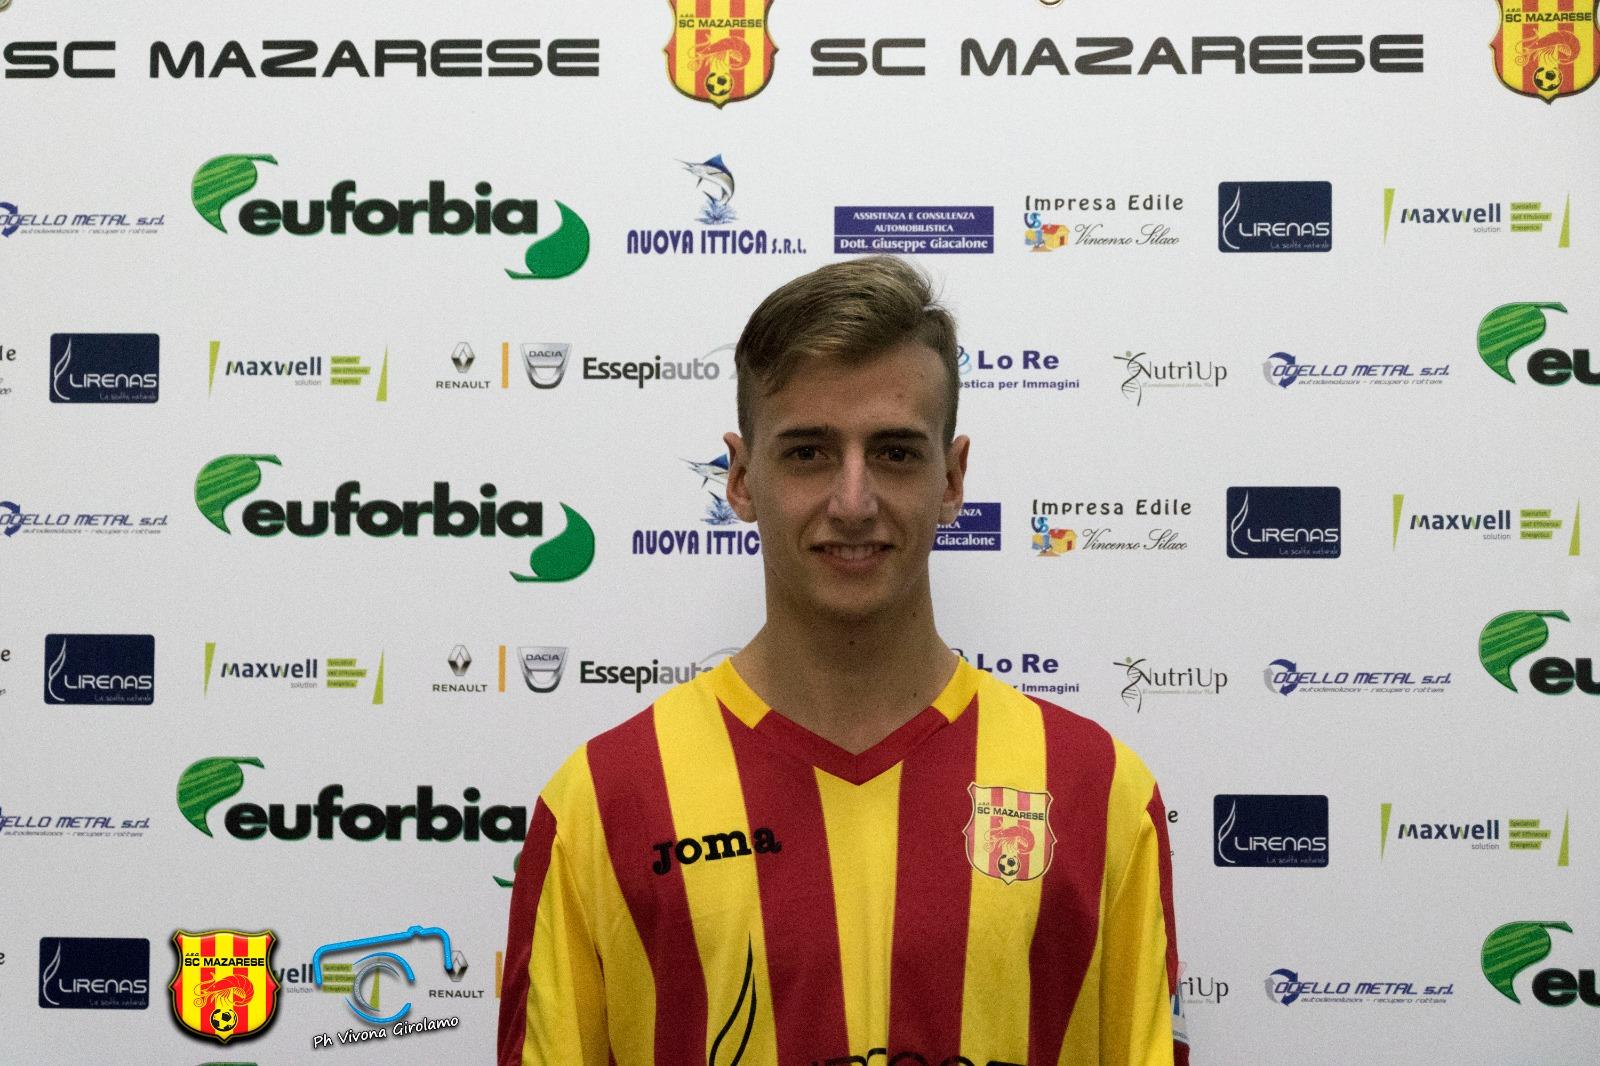 Calcio 1°categoria: SC MAZARESE - COLOMBA BIANCA 6-1